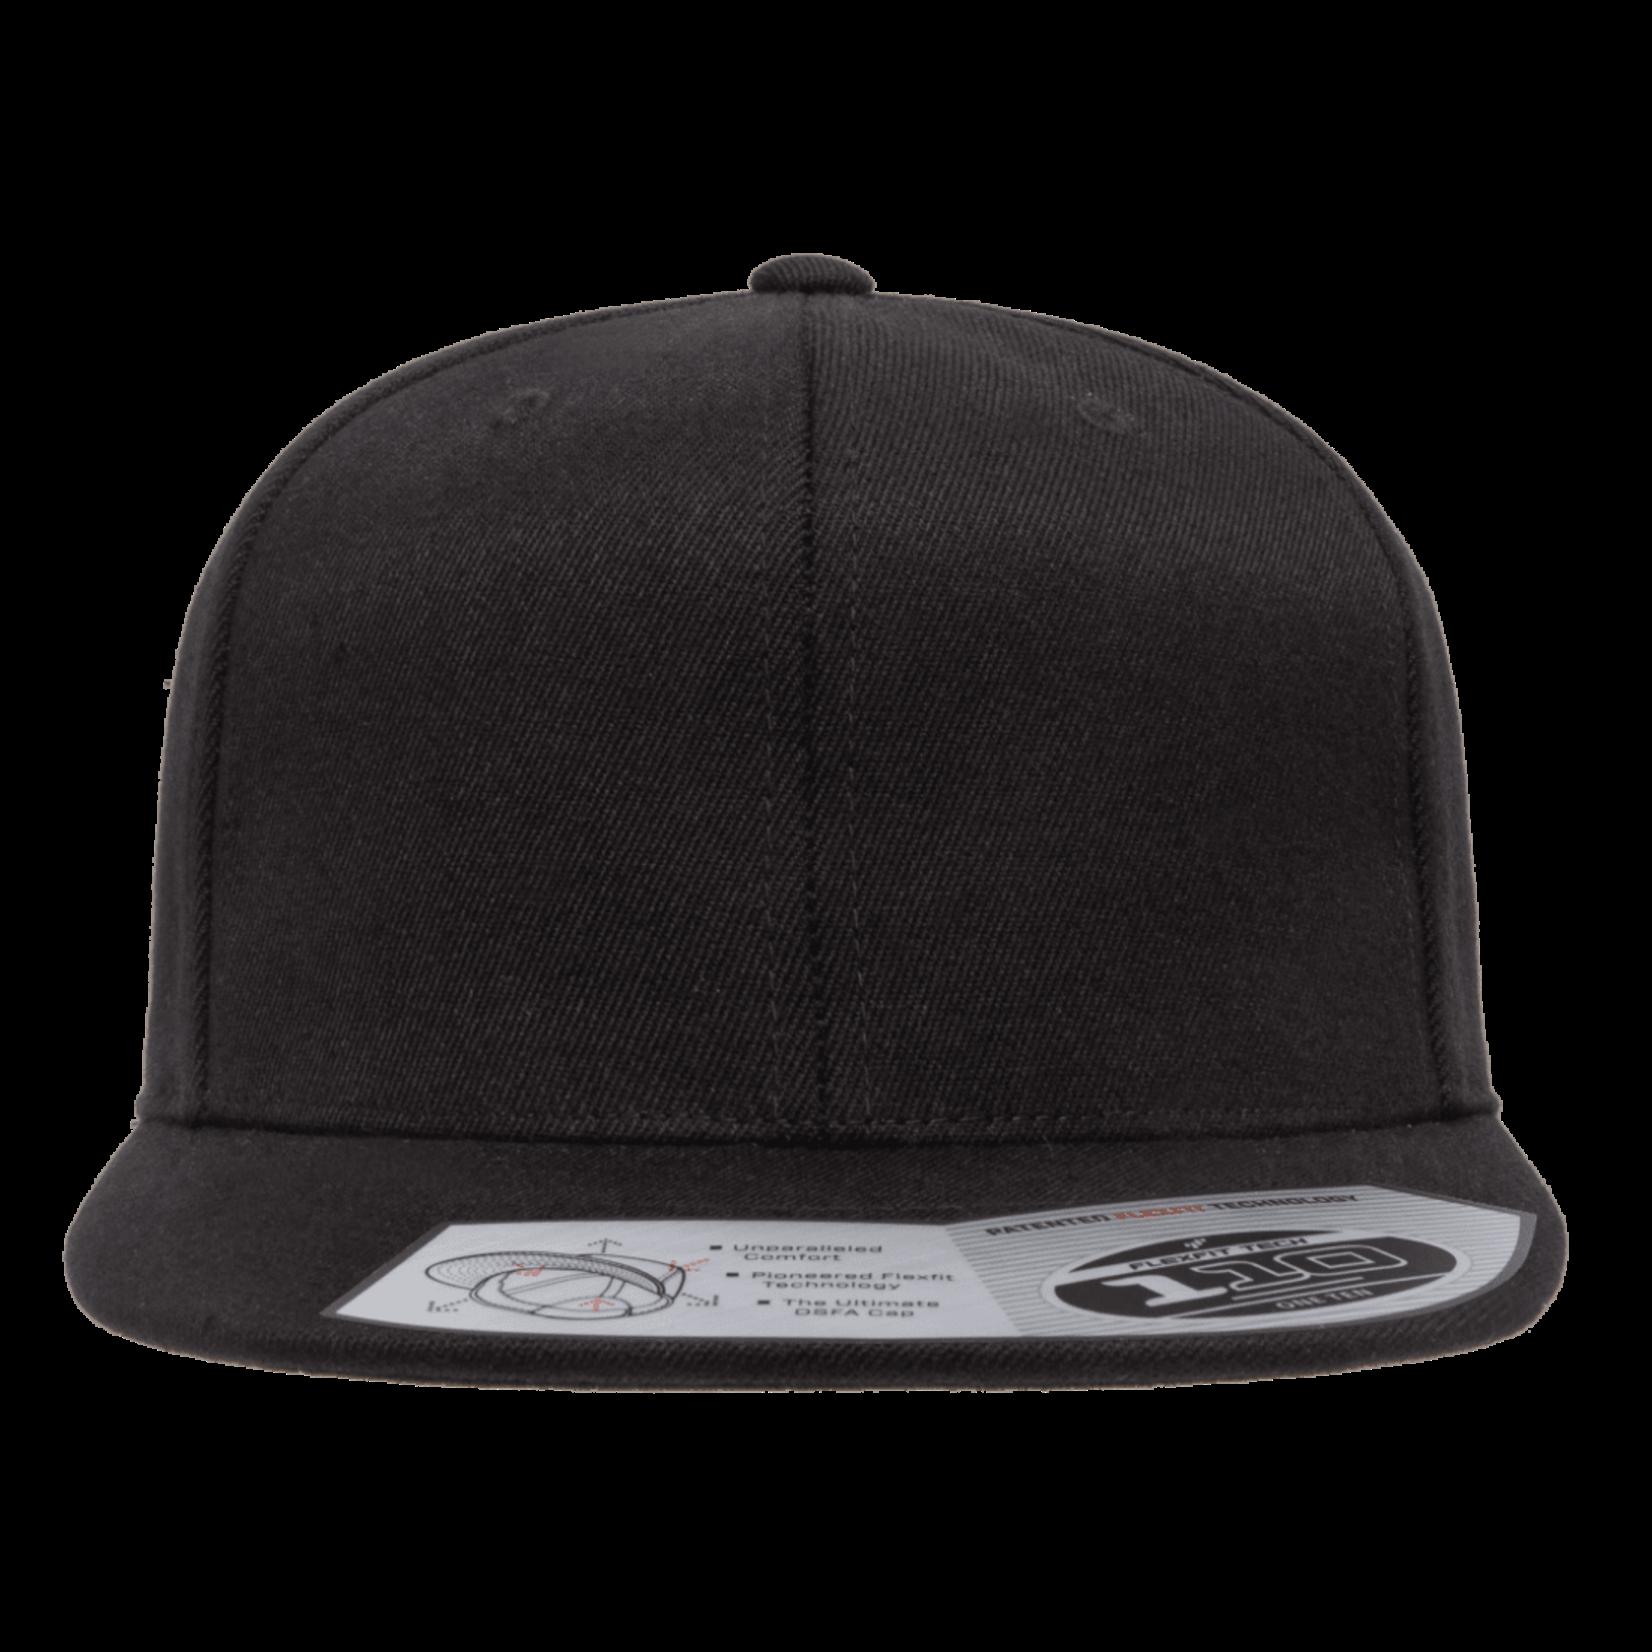 Flexfit Flexfit 110F Premium Snapback Hat - Black